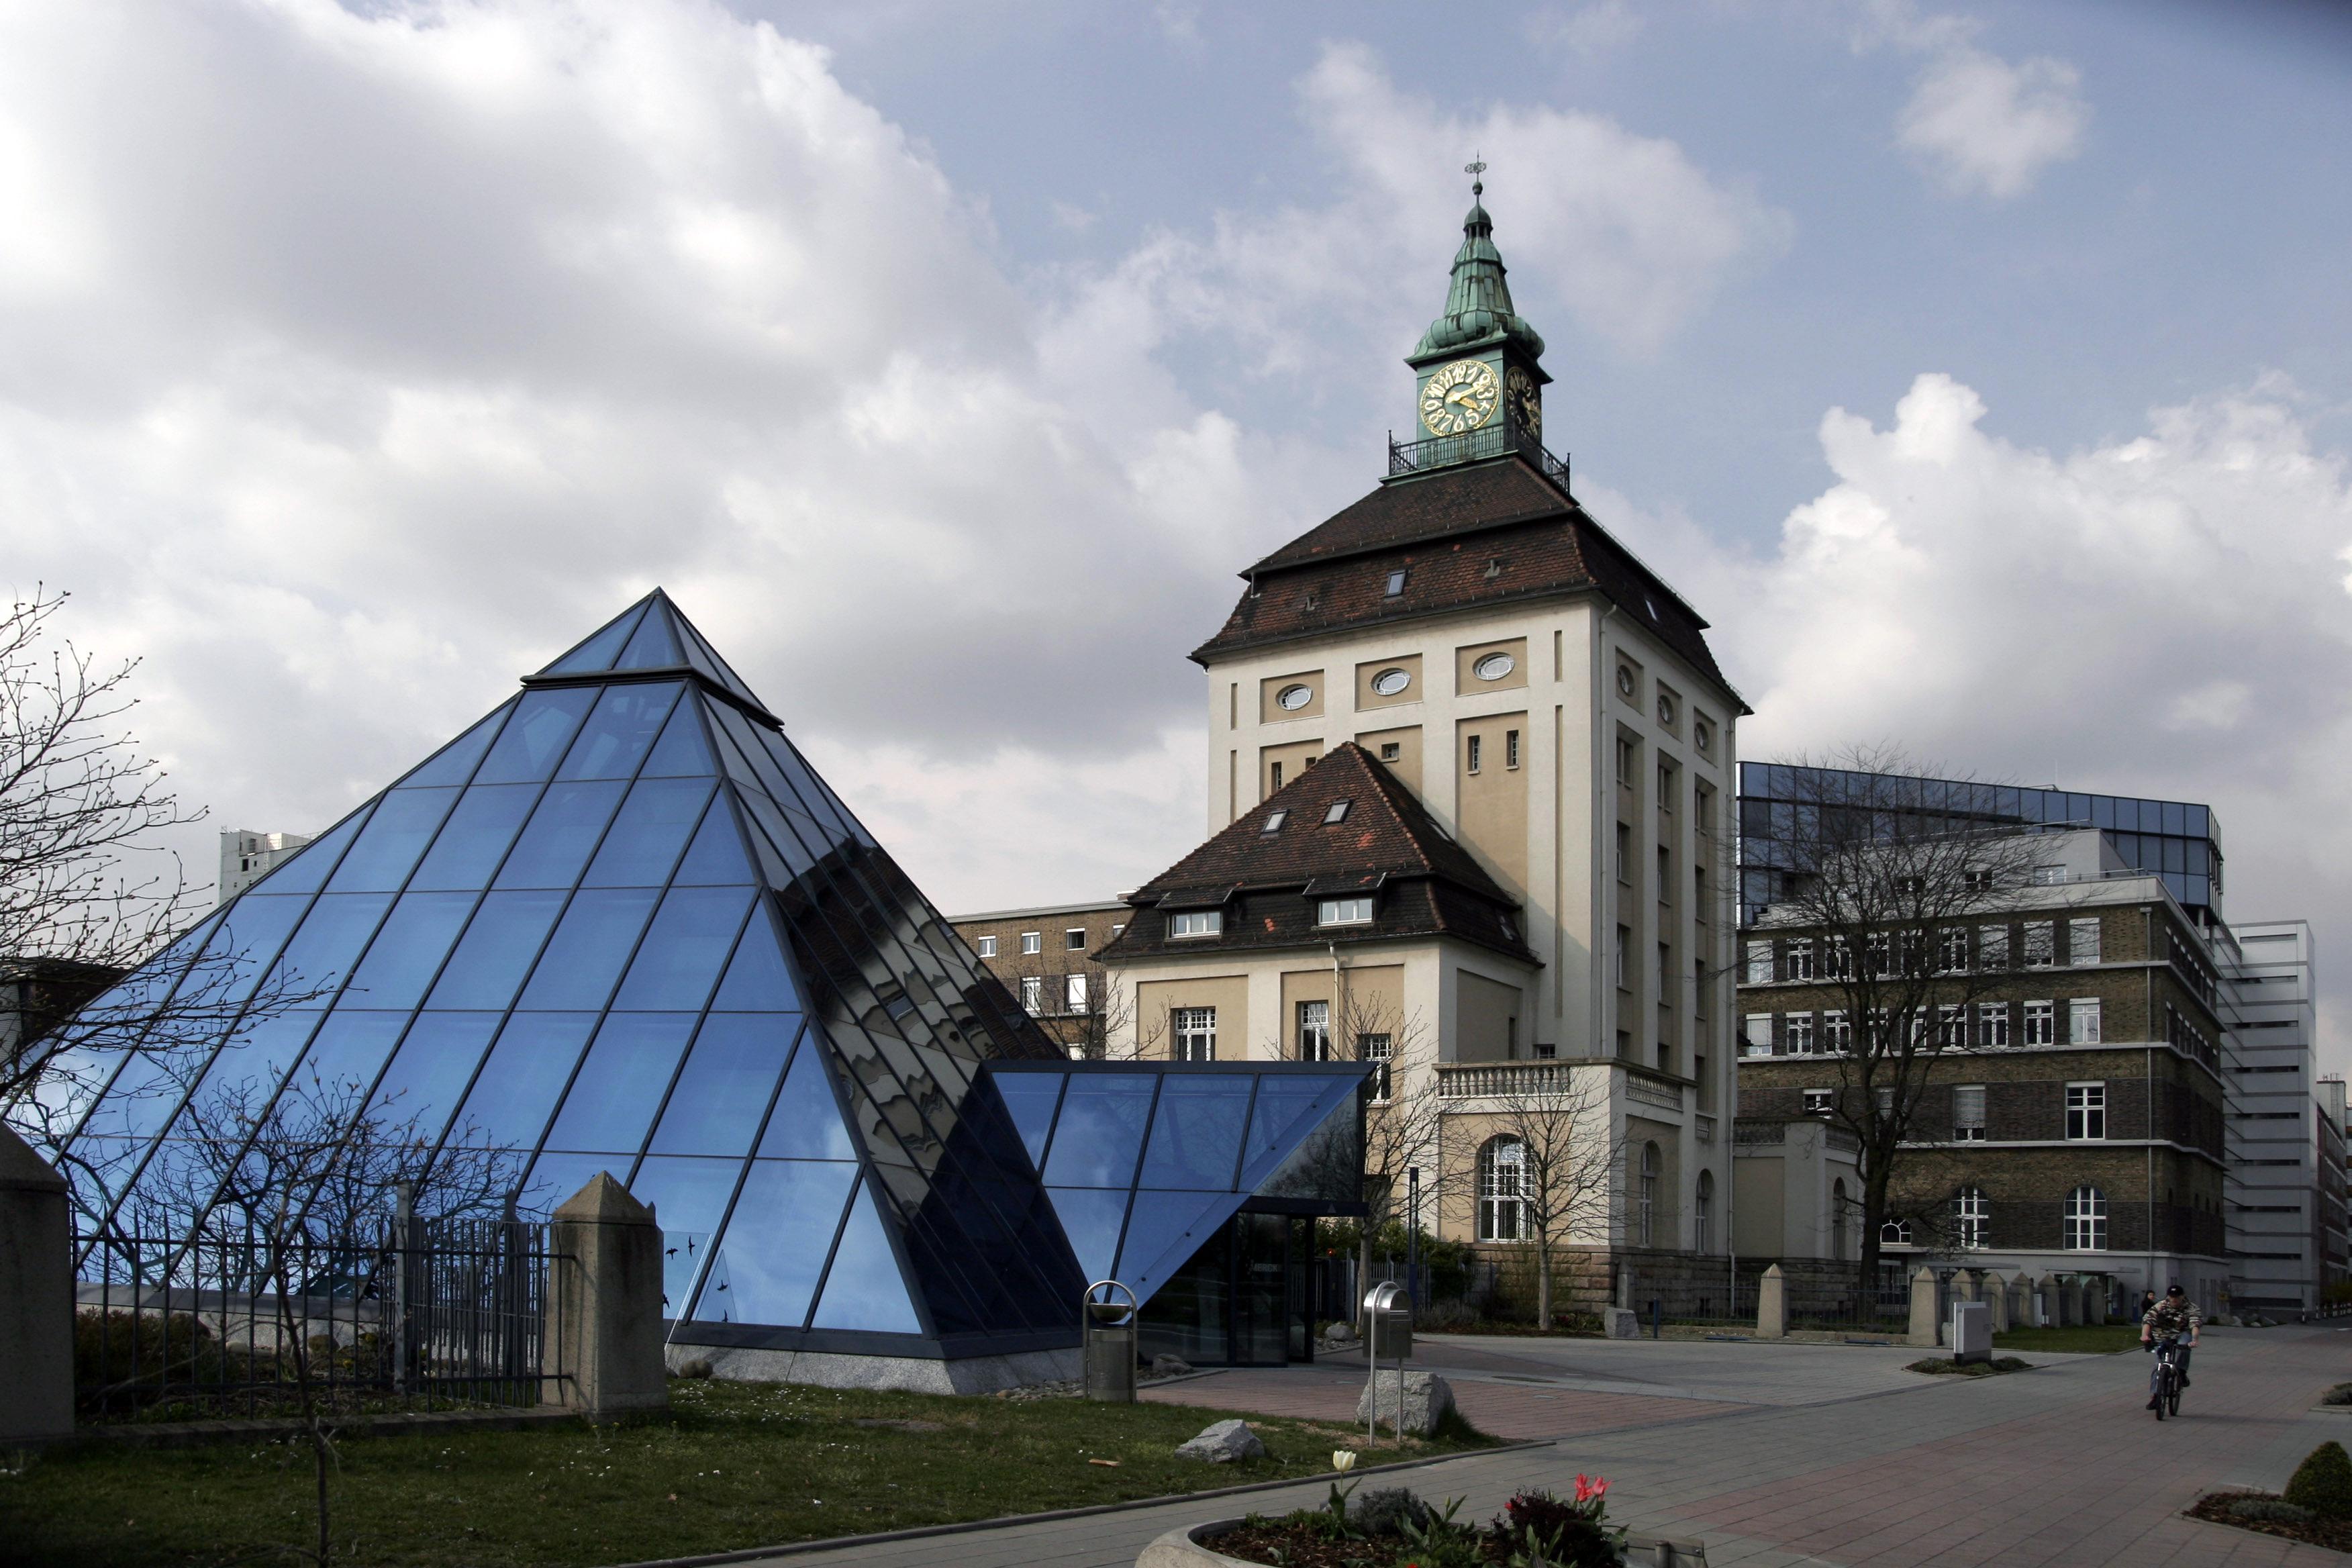 File:Merck KGaA Pyramide Gruener Turm.jpg - Wikipedia